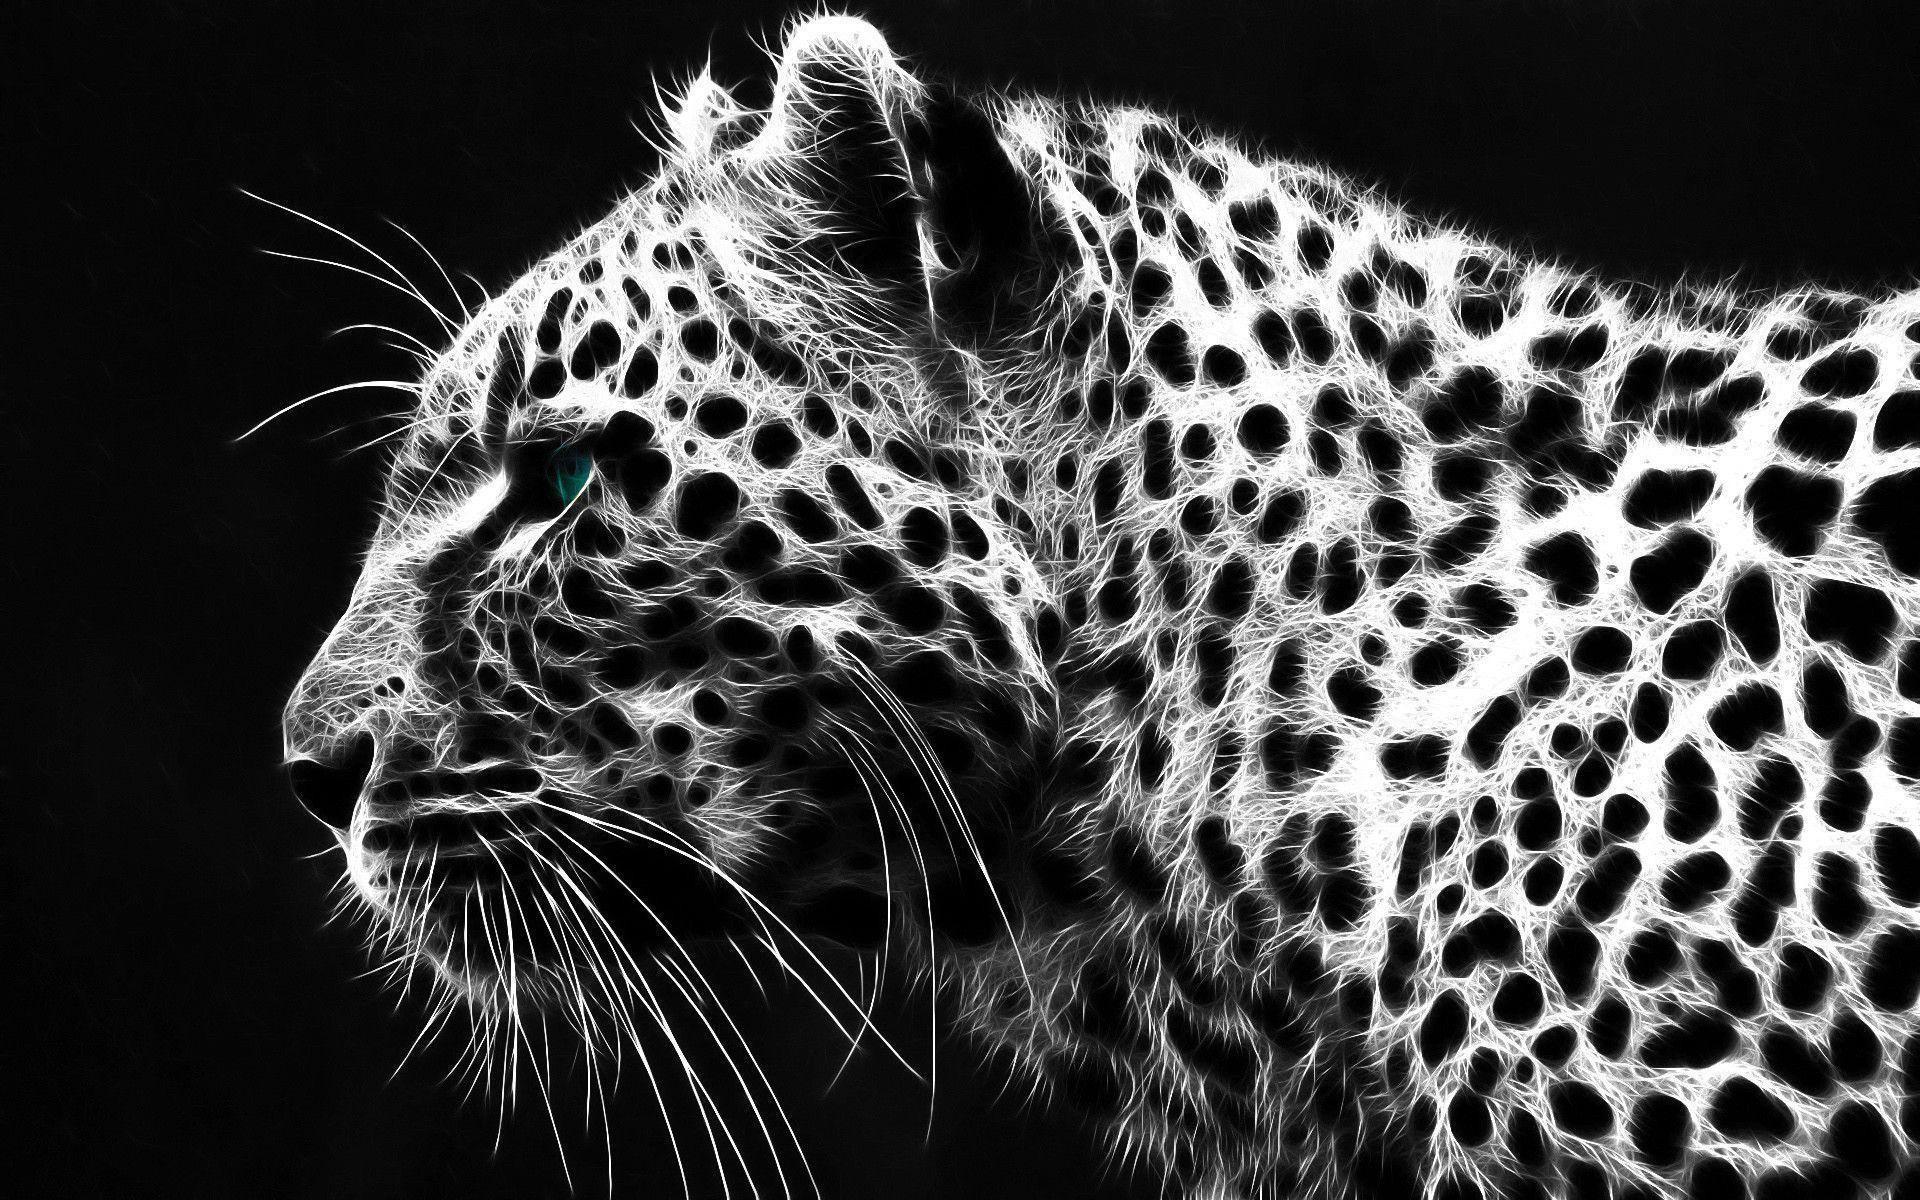 Cheetah wallpaper 72 images 1920x1080 cute cheetah wallpaper voltagebd Image collections